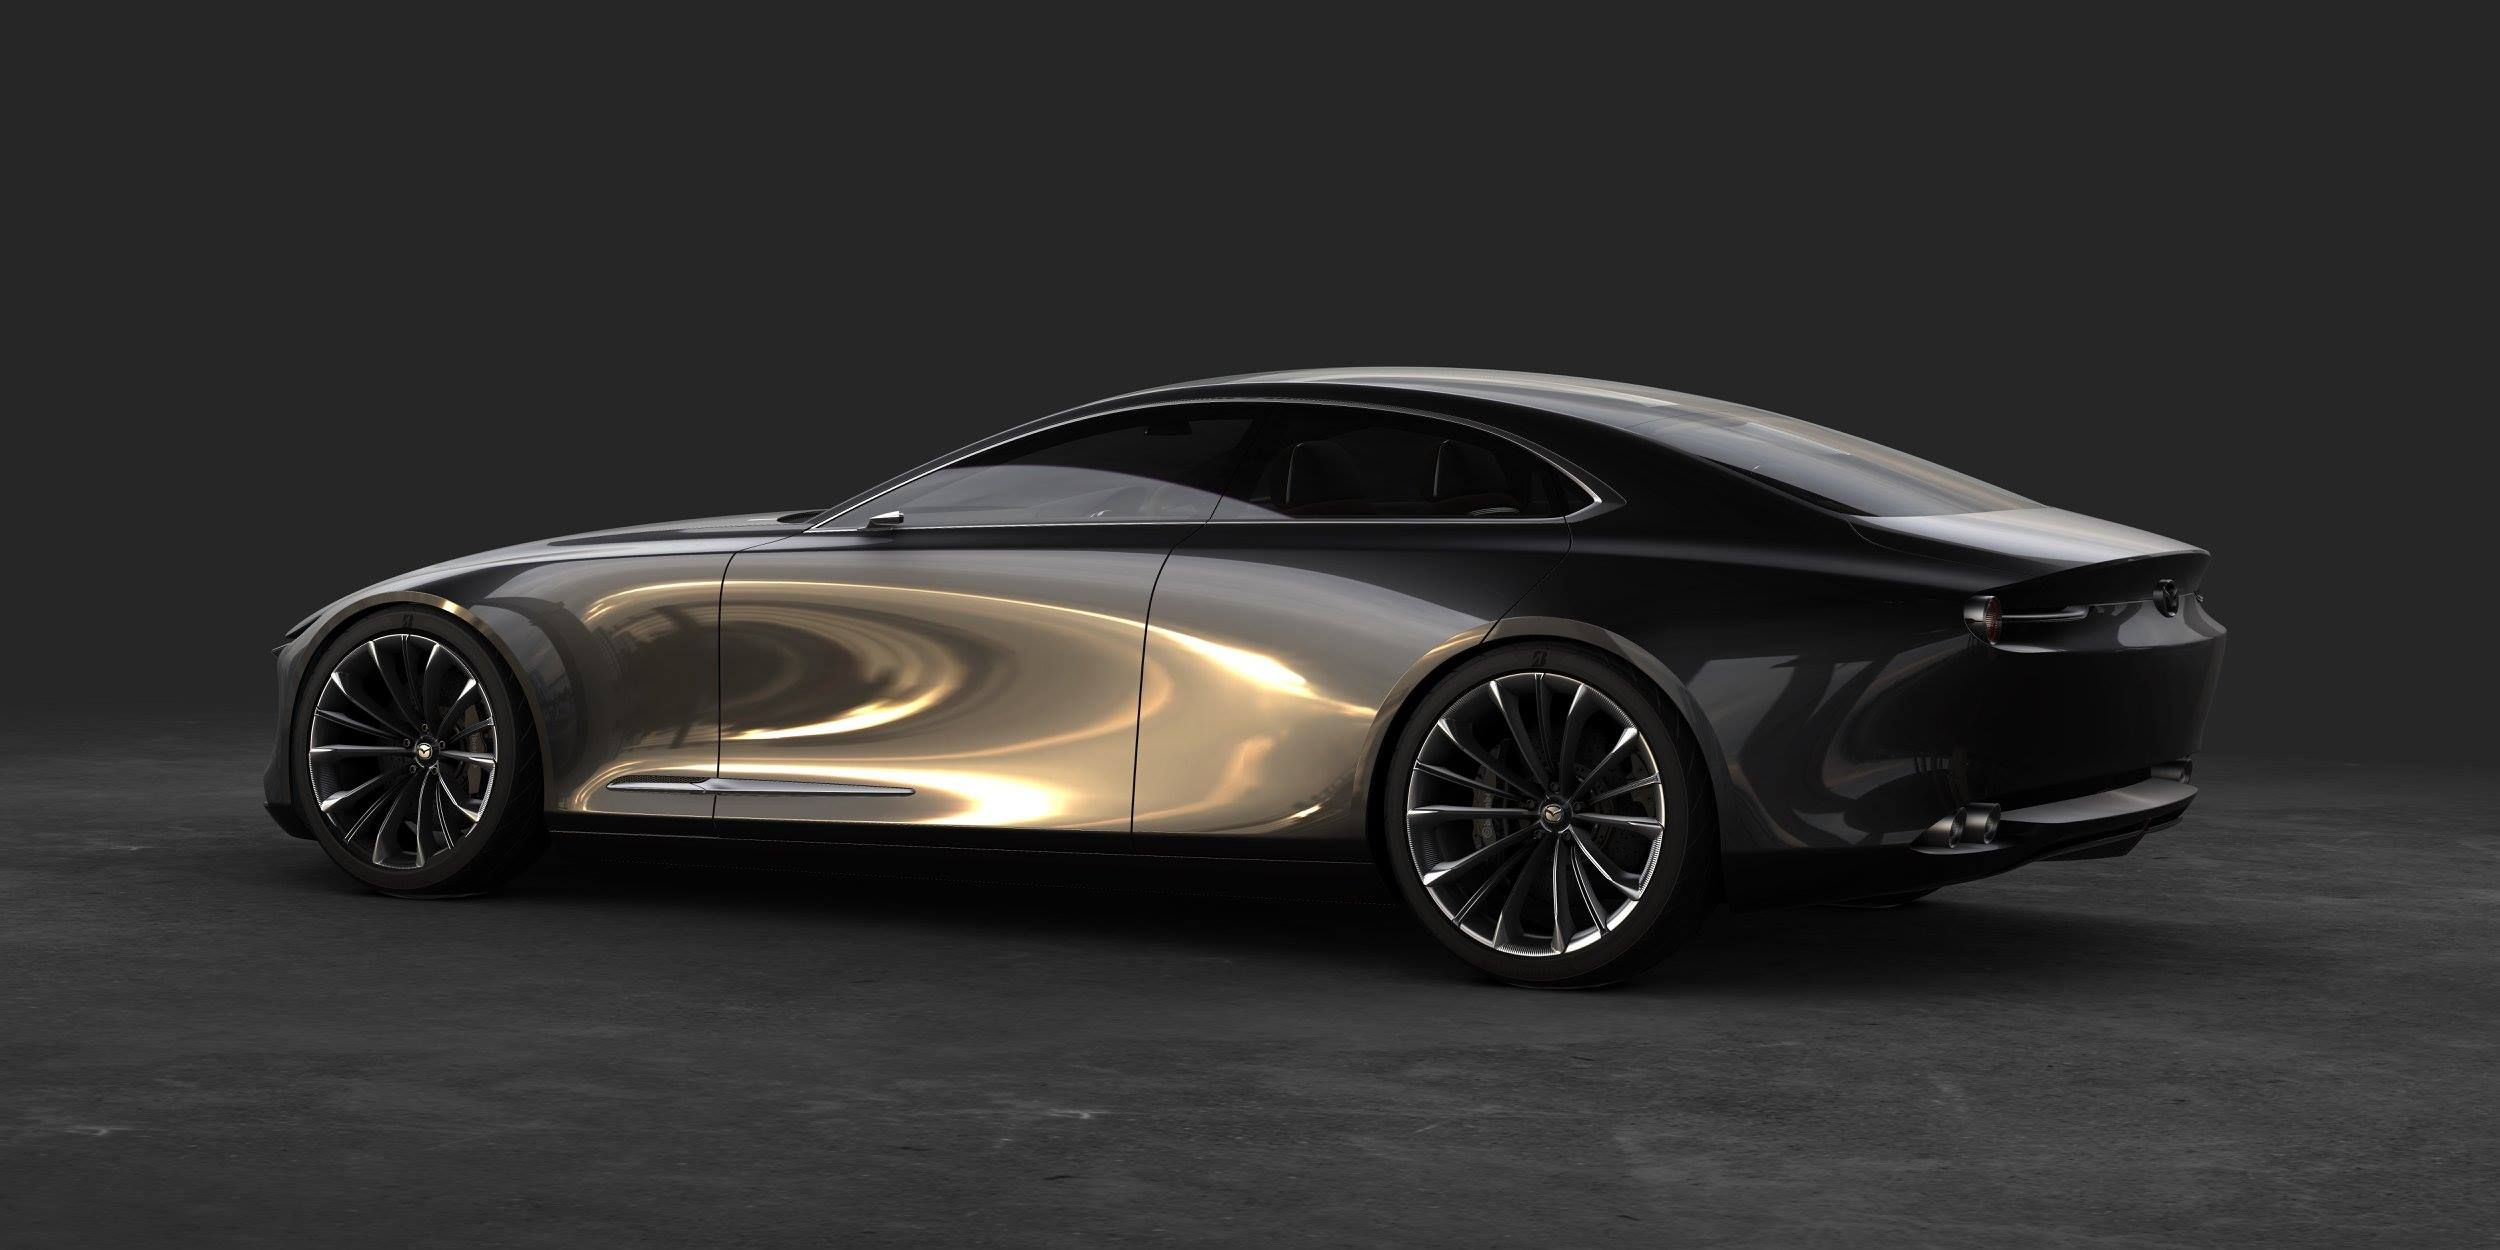 Блясък, изящество, красота... 😘😍😚 Mazda Tokyo motor